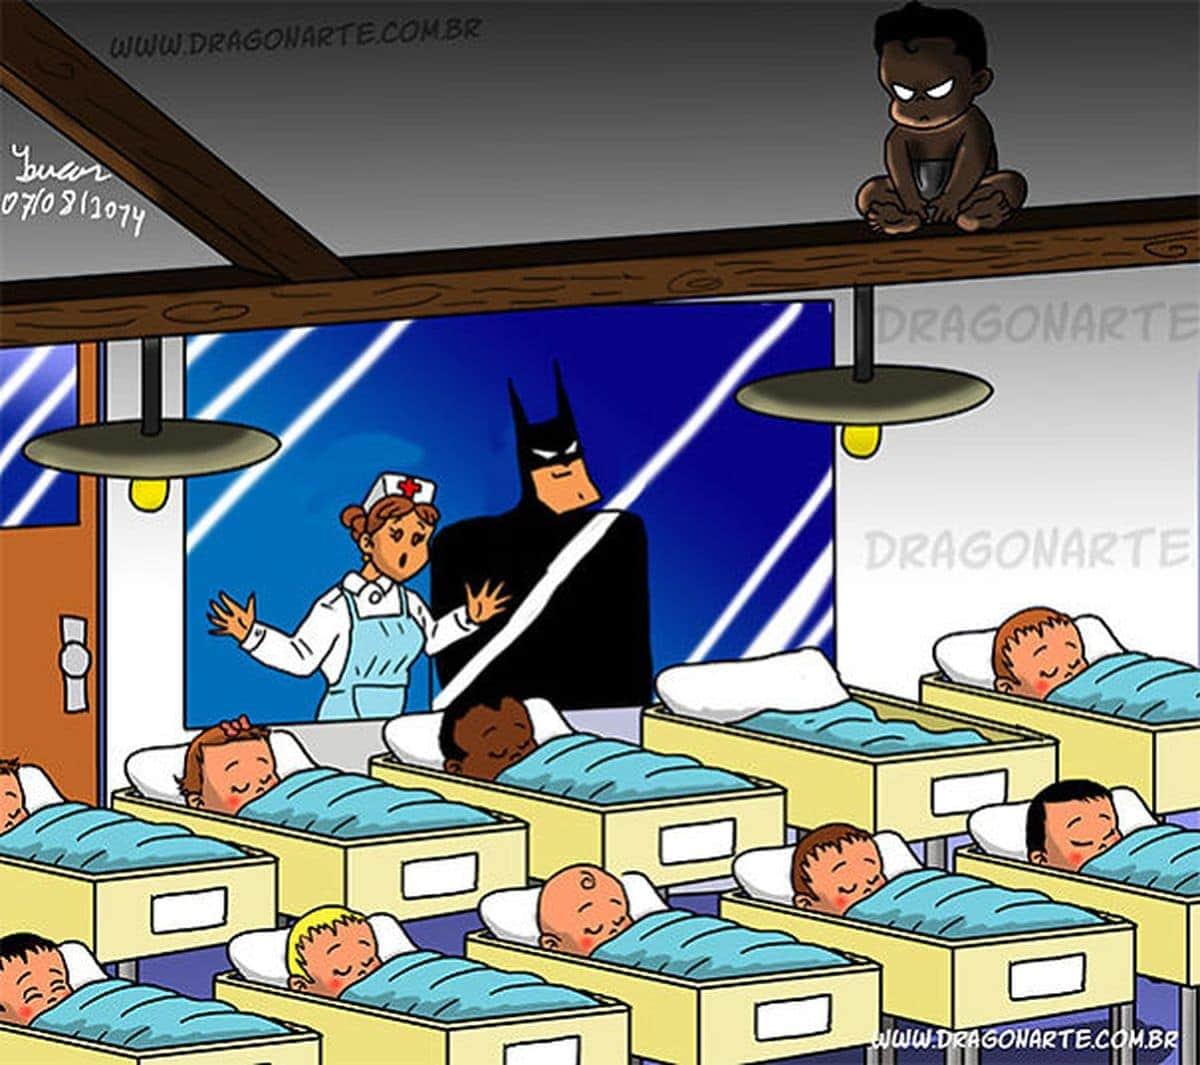 Superhelden-Babies von Lucas Eduardo Nascimento | Design/Kunst | Was is hier eigentlich los?